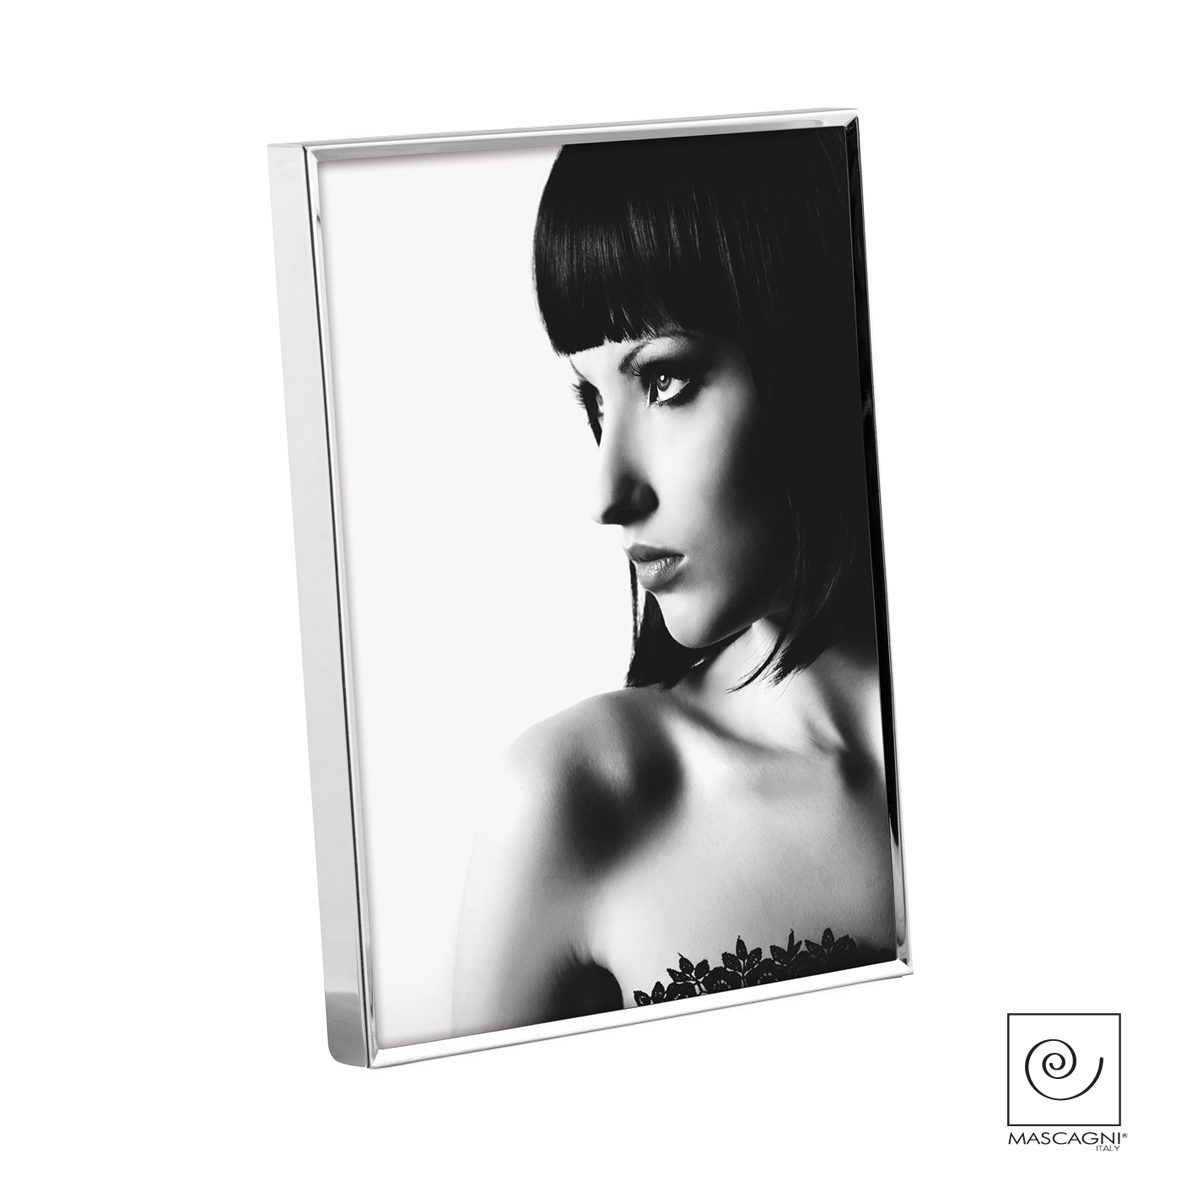 Art Mascagni A539 PHOTO FRAME 10X15